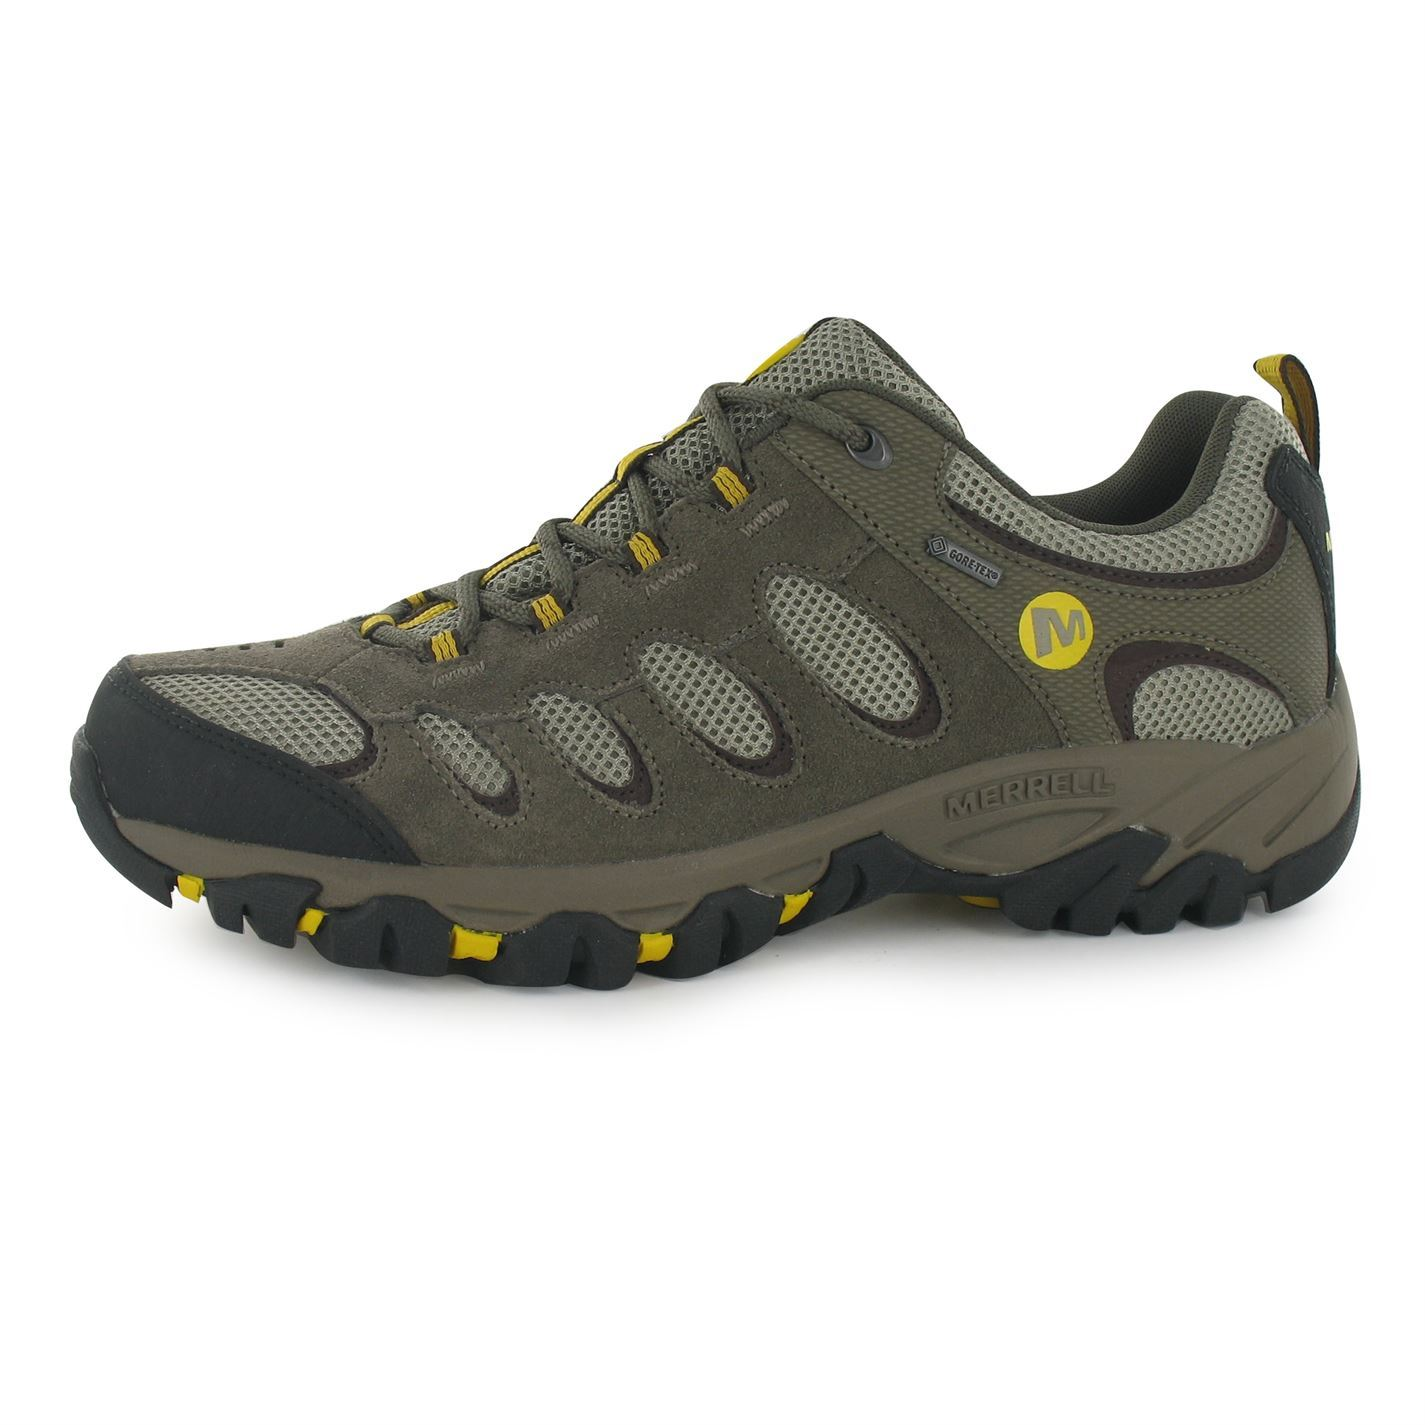 Merrell Gtx Mens Walking Shoes